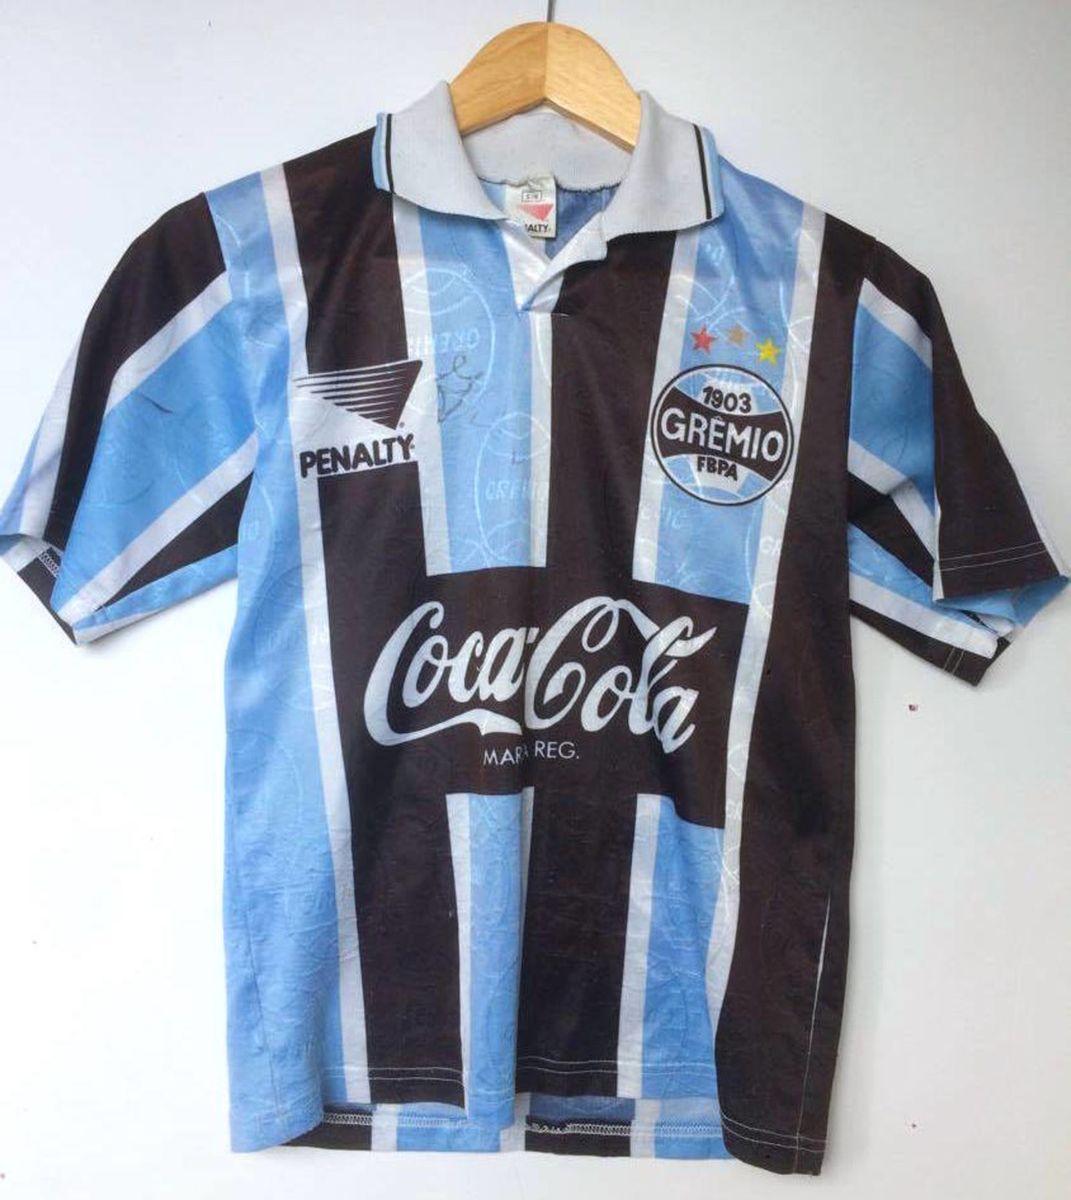 camisa grêmio 1994 penalty - camisas grêmio penalty 41a9d97598e78